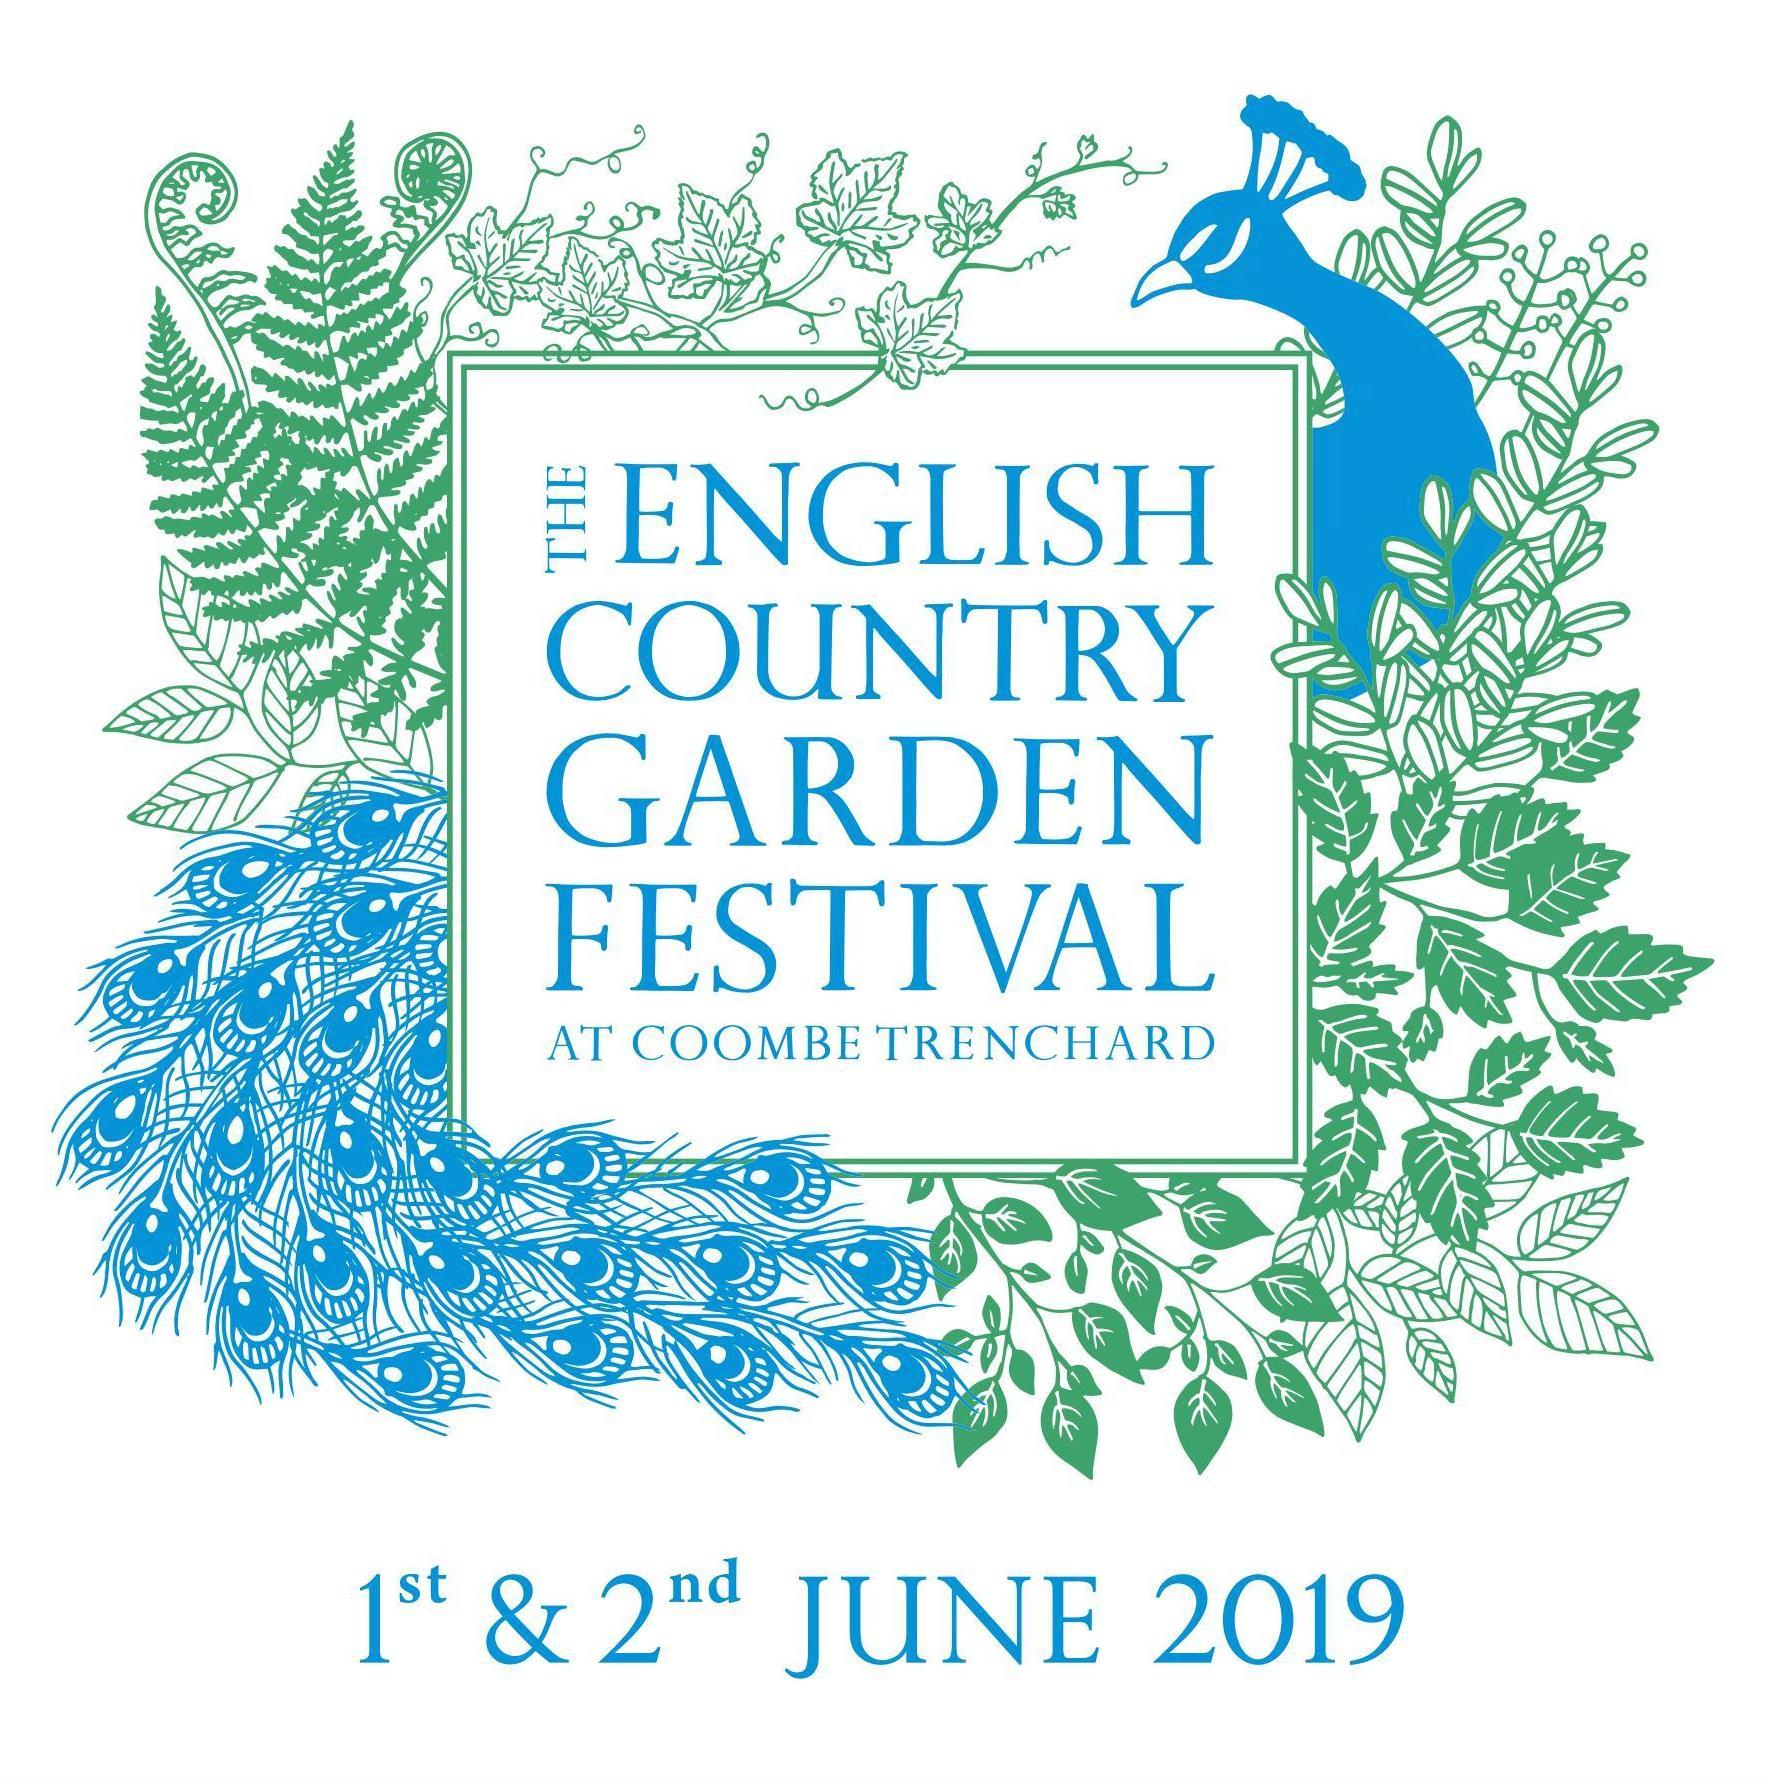 2019 garden festival poster copy cropped.jpg